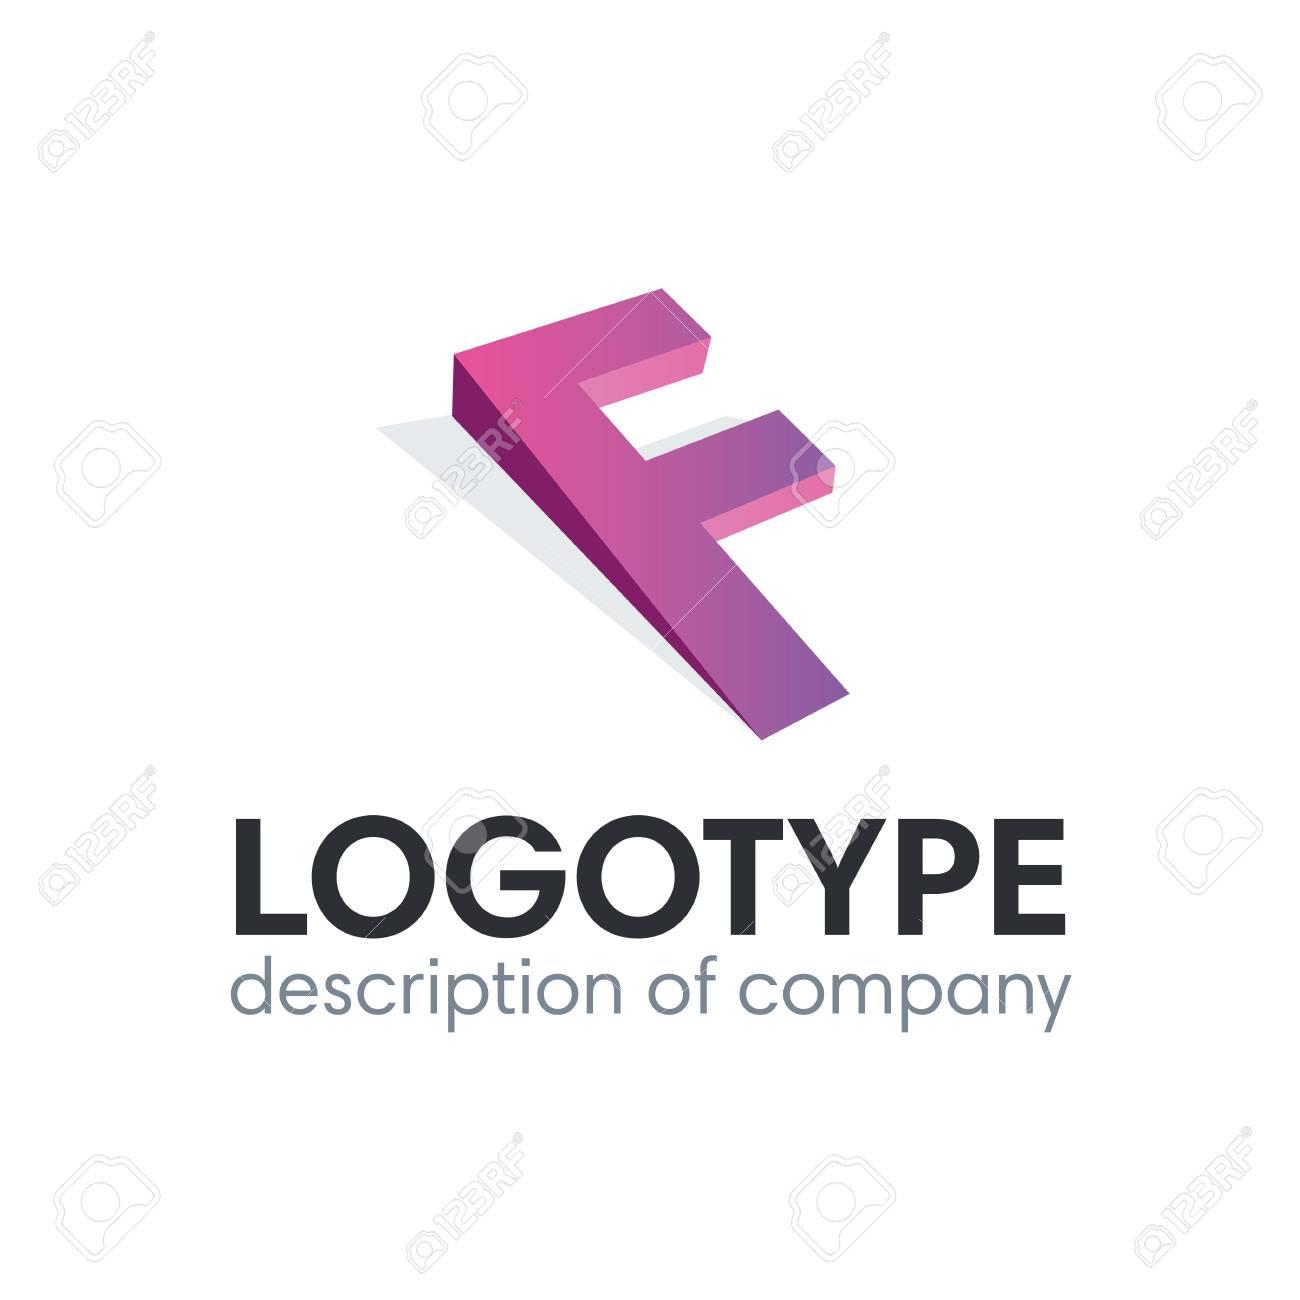 Letter F logo icon design template elements illustration. - 84037610